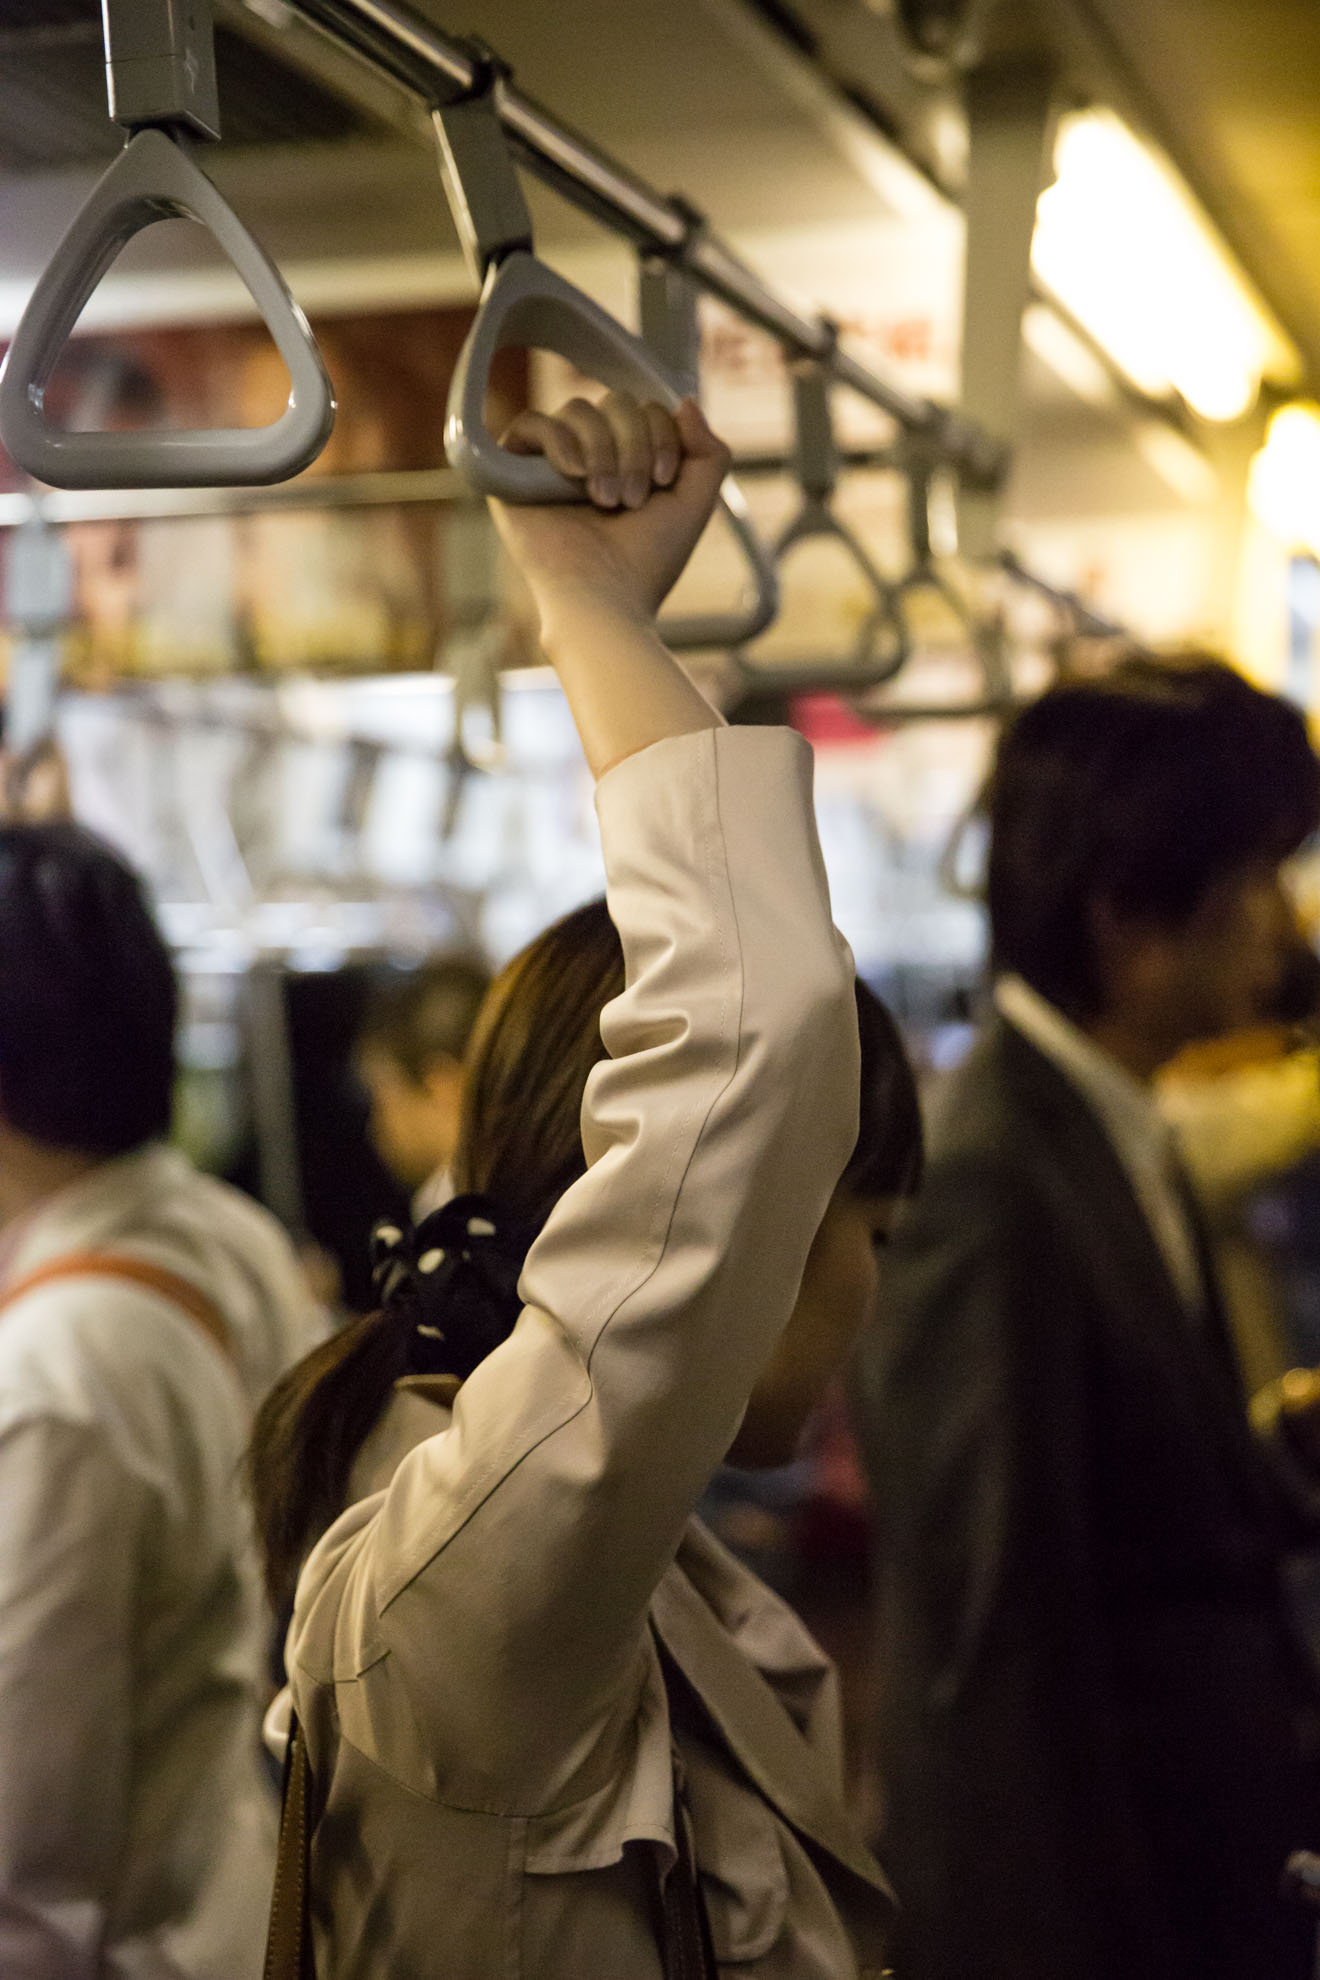 #tokyo, #Shibuya, #Shinjuku, #Odaiba, #Harajuku, #pacific, #pacificocean, #Akihabara, #Roppongi, #Ryogoku, #streetart, #sacàdos #polynesia, #frenchpolynesia, #kyoto, #neon, #people, #art life, #artoftheday, #frenchpolynesiaartist, #canon5dmarkIII, #sushi, #travel, #voyage,